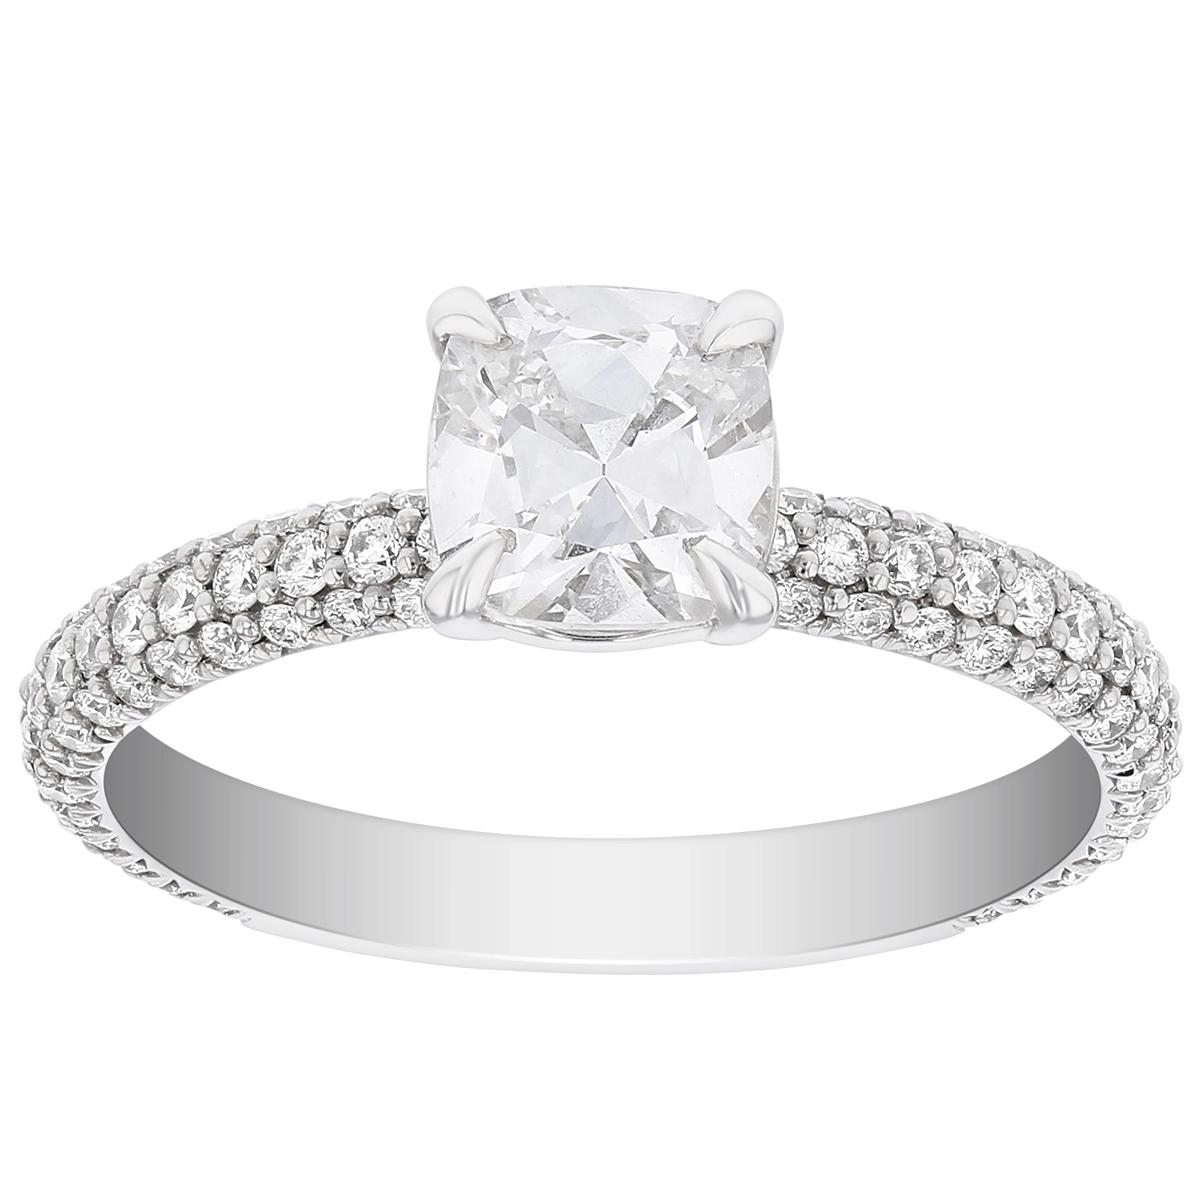 Elege 18K White Gold Cushion Diamond Ring With Diamond